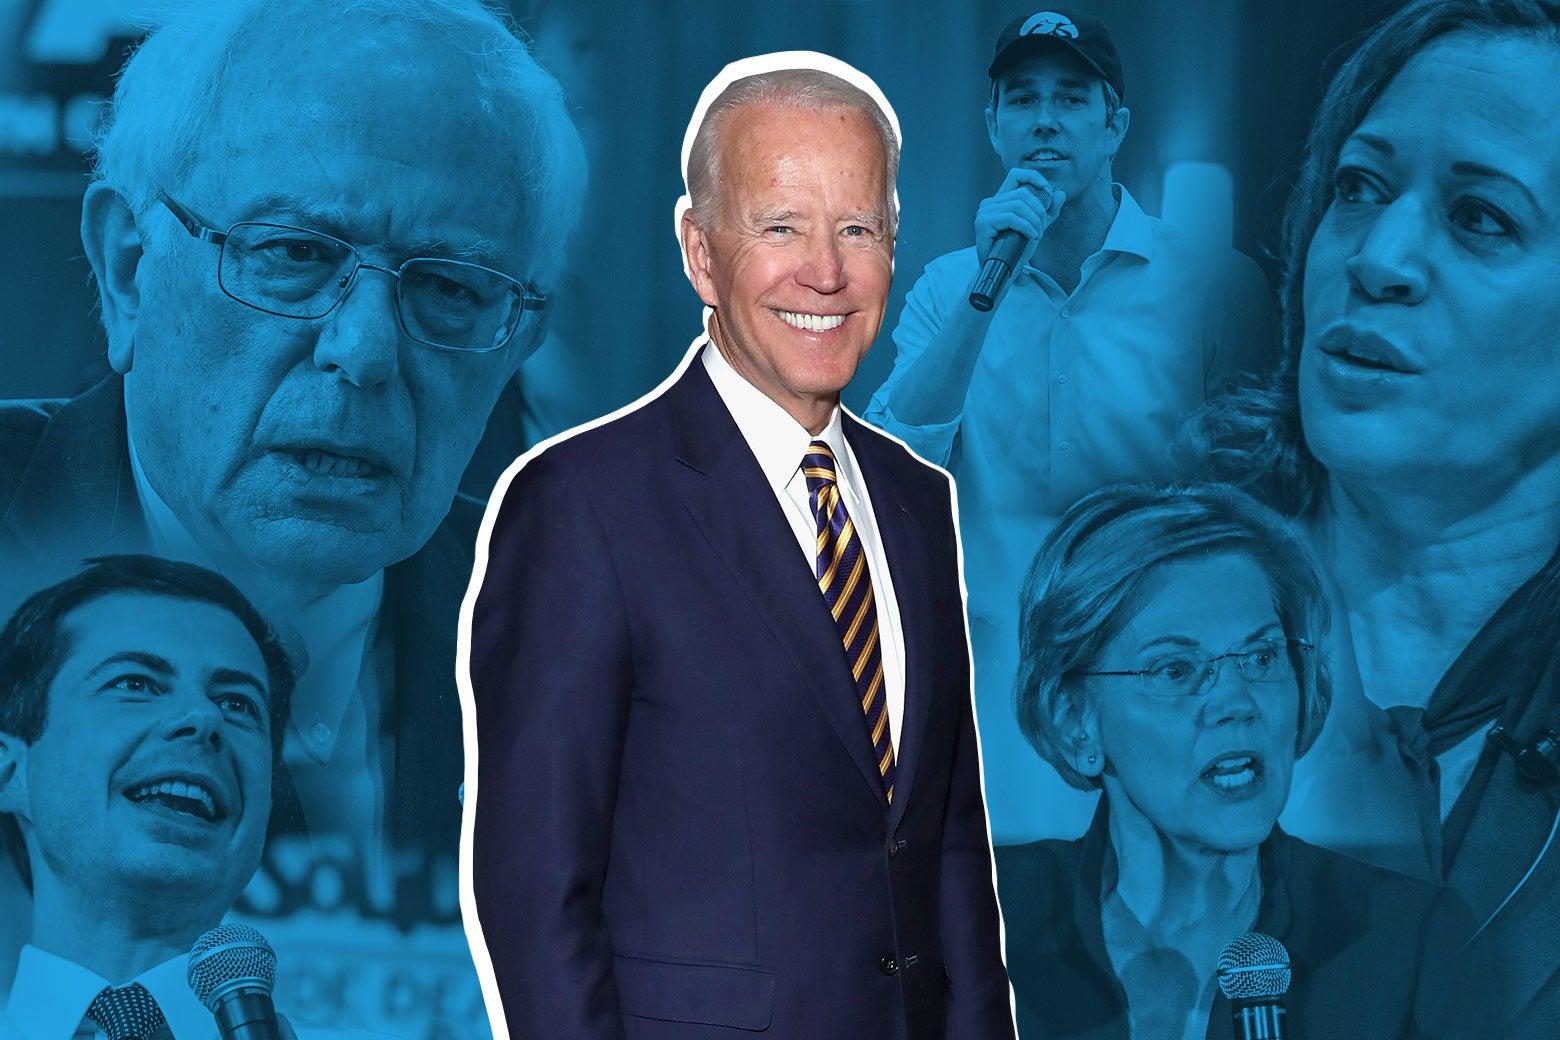 Photo collage of 2020 Democratic presidential hopefuls: Pete Buttigieg, Bernie Sanders, Beto O'Rourke, Kamala Harris, and Elizabeth Warren, with Joe Biden in the center.